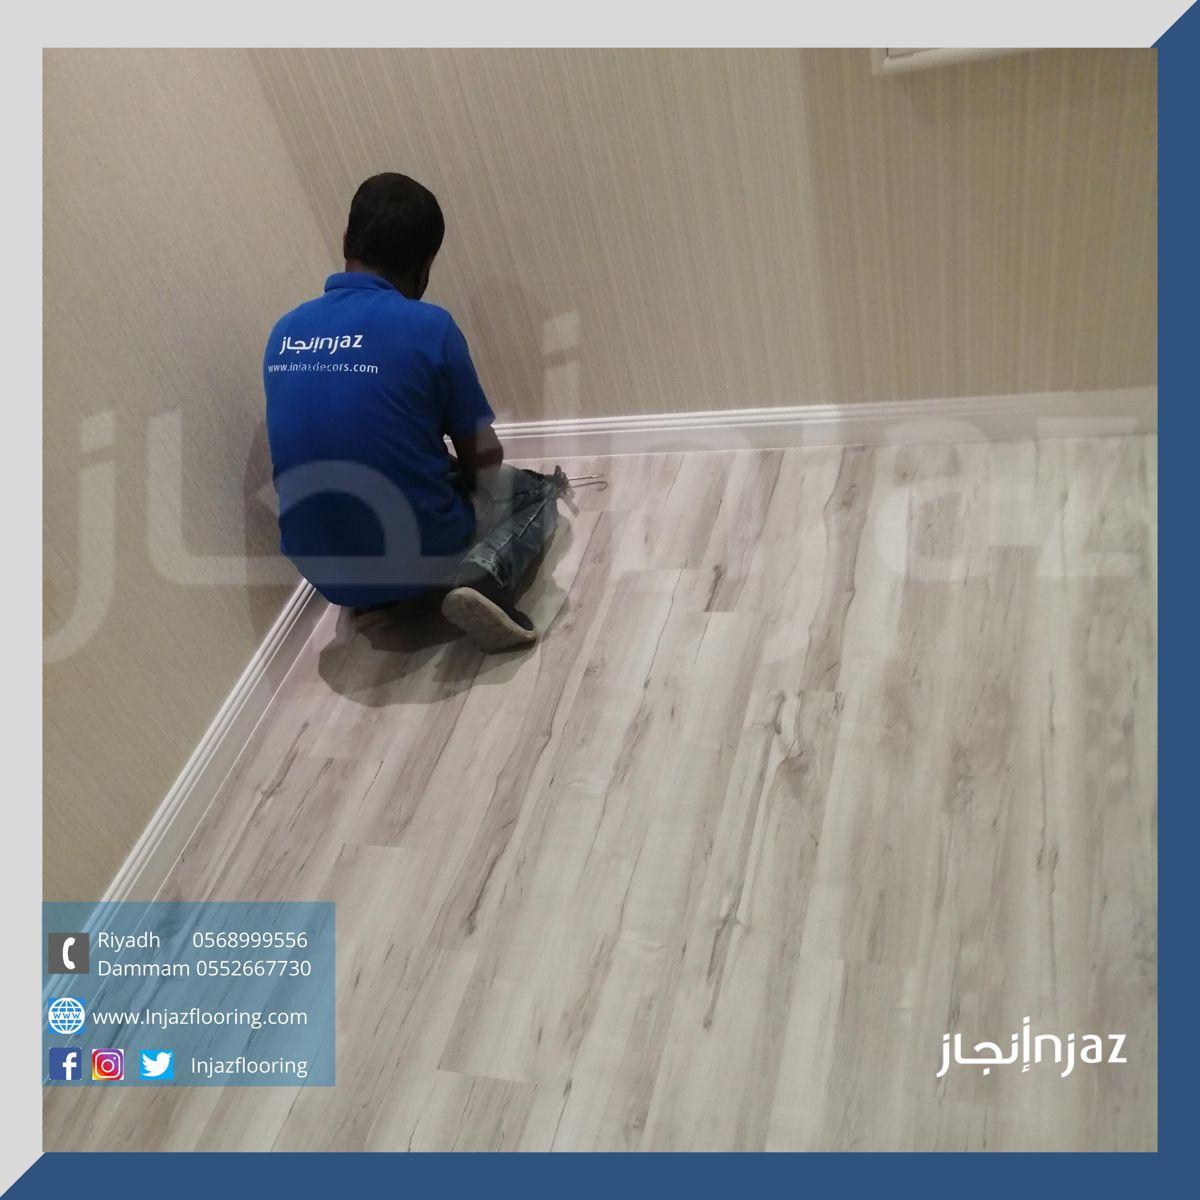 Spc من أعمالنا تركيب أرضيات ضد الماء Home Appliances Vacuum Vacuum Cleaner